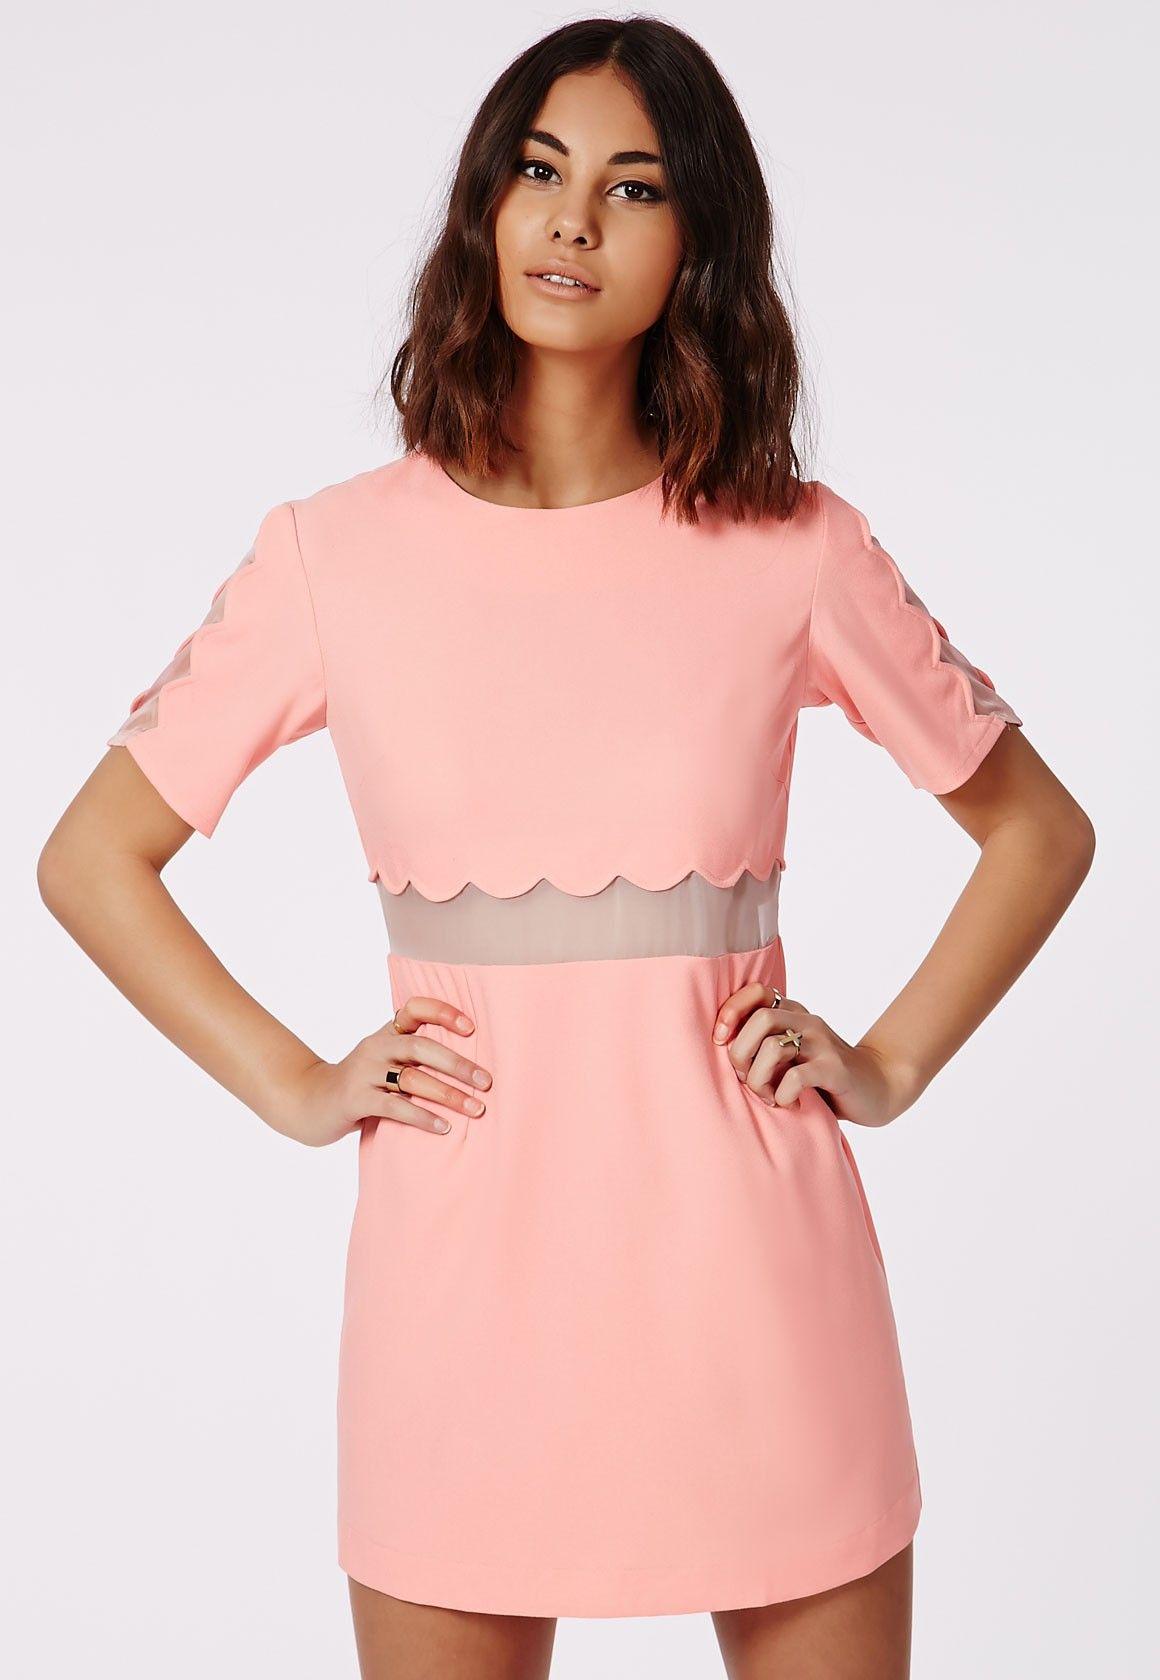 db41e1a86f0 Verity Crepe Scallop Shift Dress Pastel Pink - Dresses - Shift Dresses -  Missguided